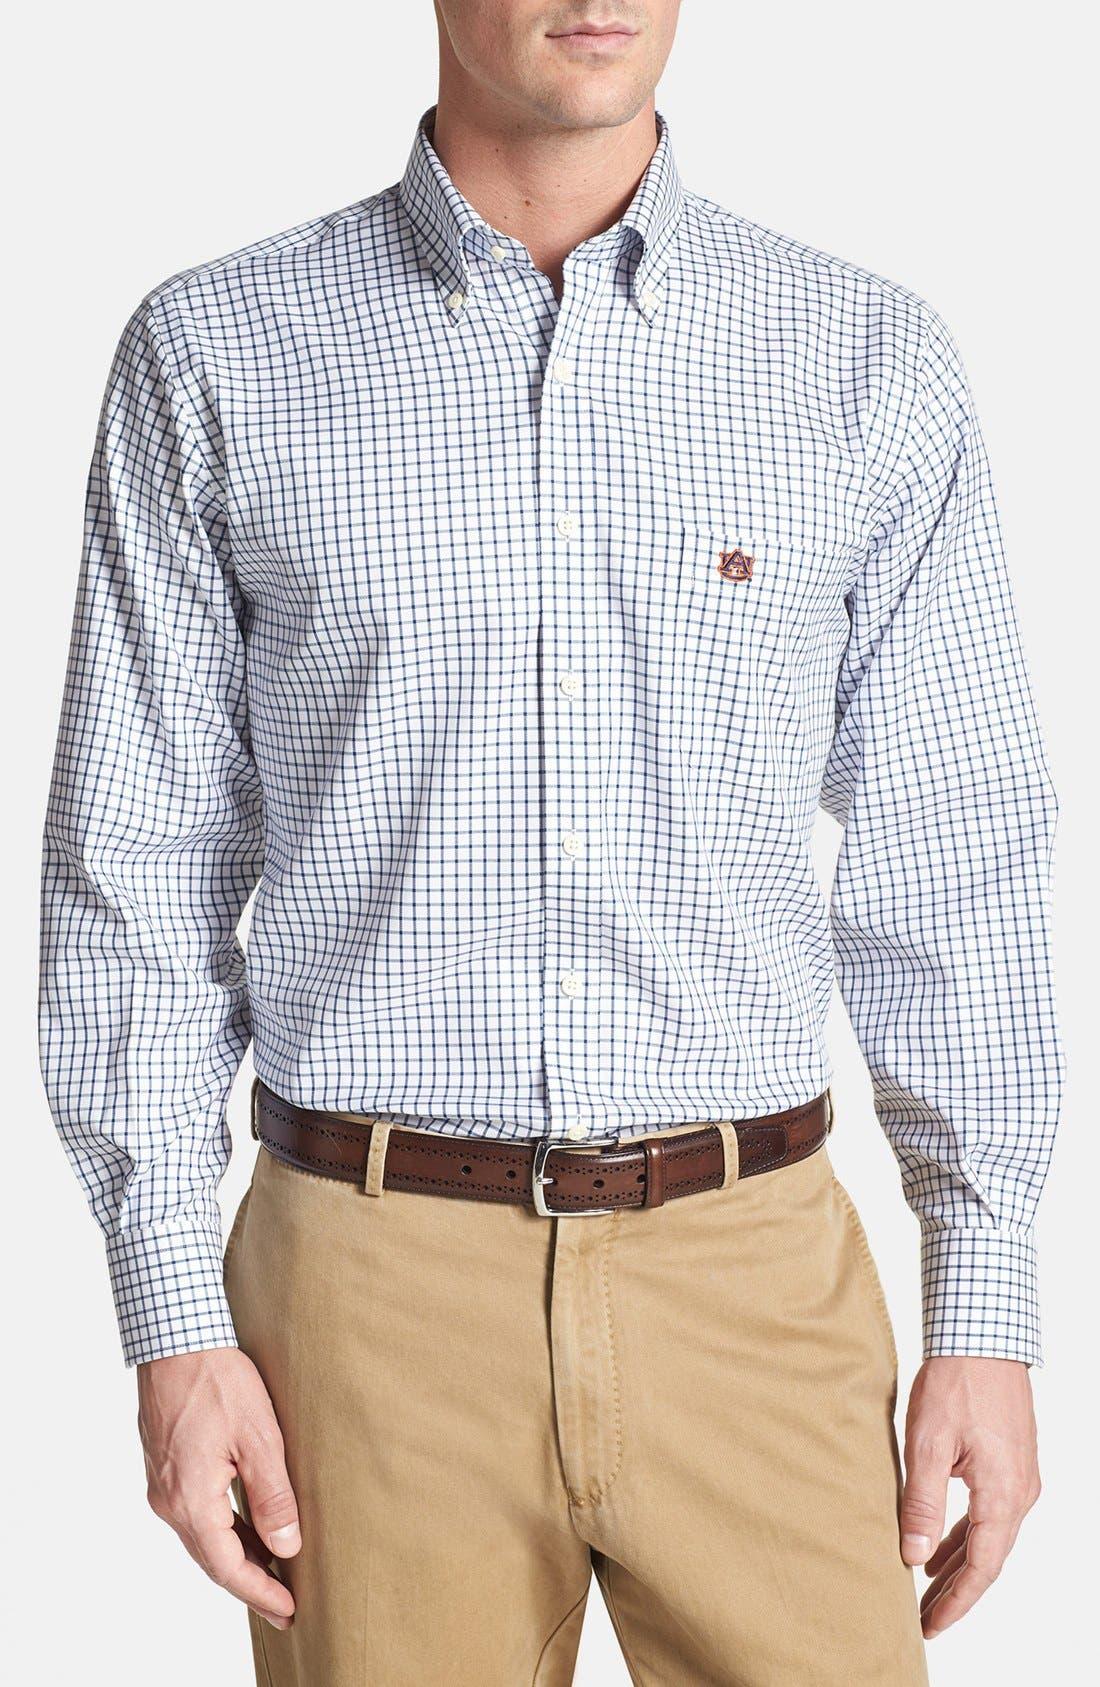 Alternate Image 1 Selected - Peter Millar 'Auburn University' Twill Sport Shirt